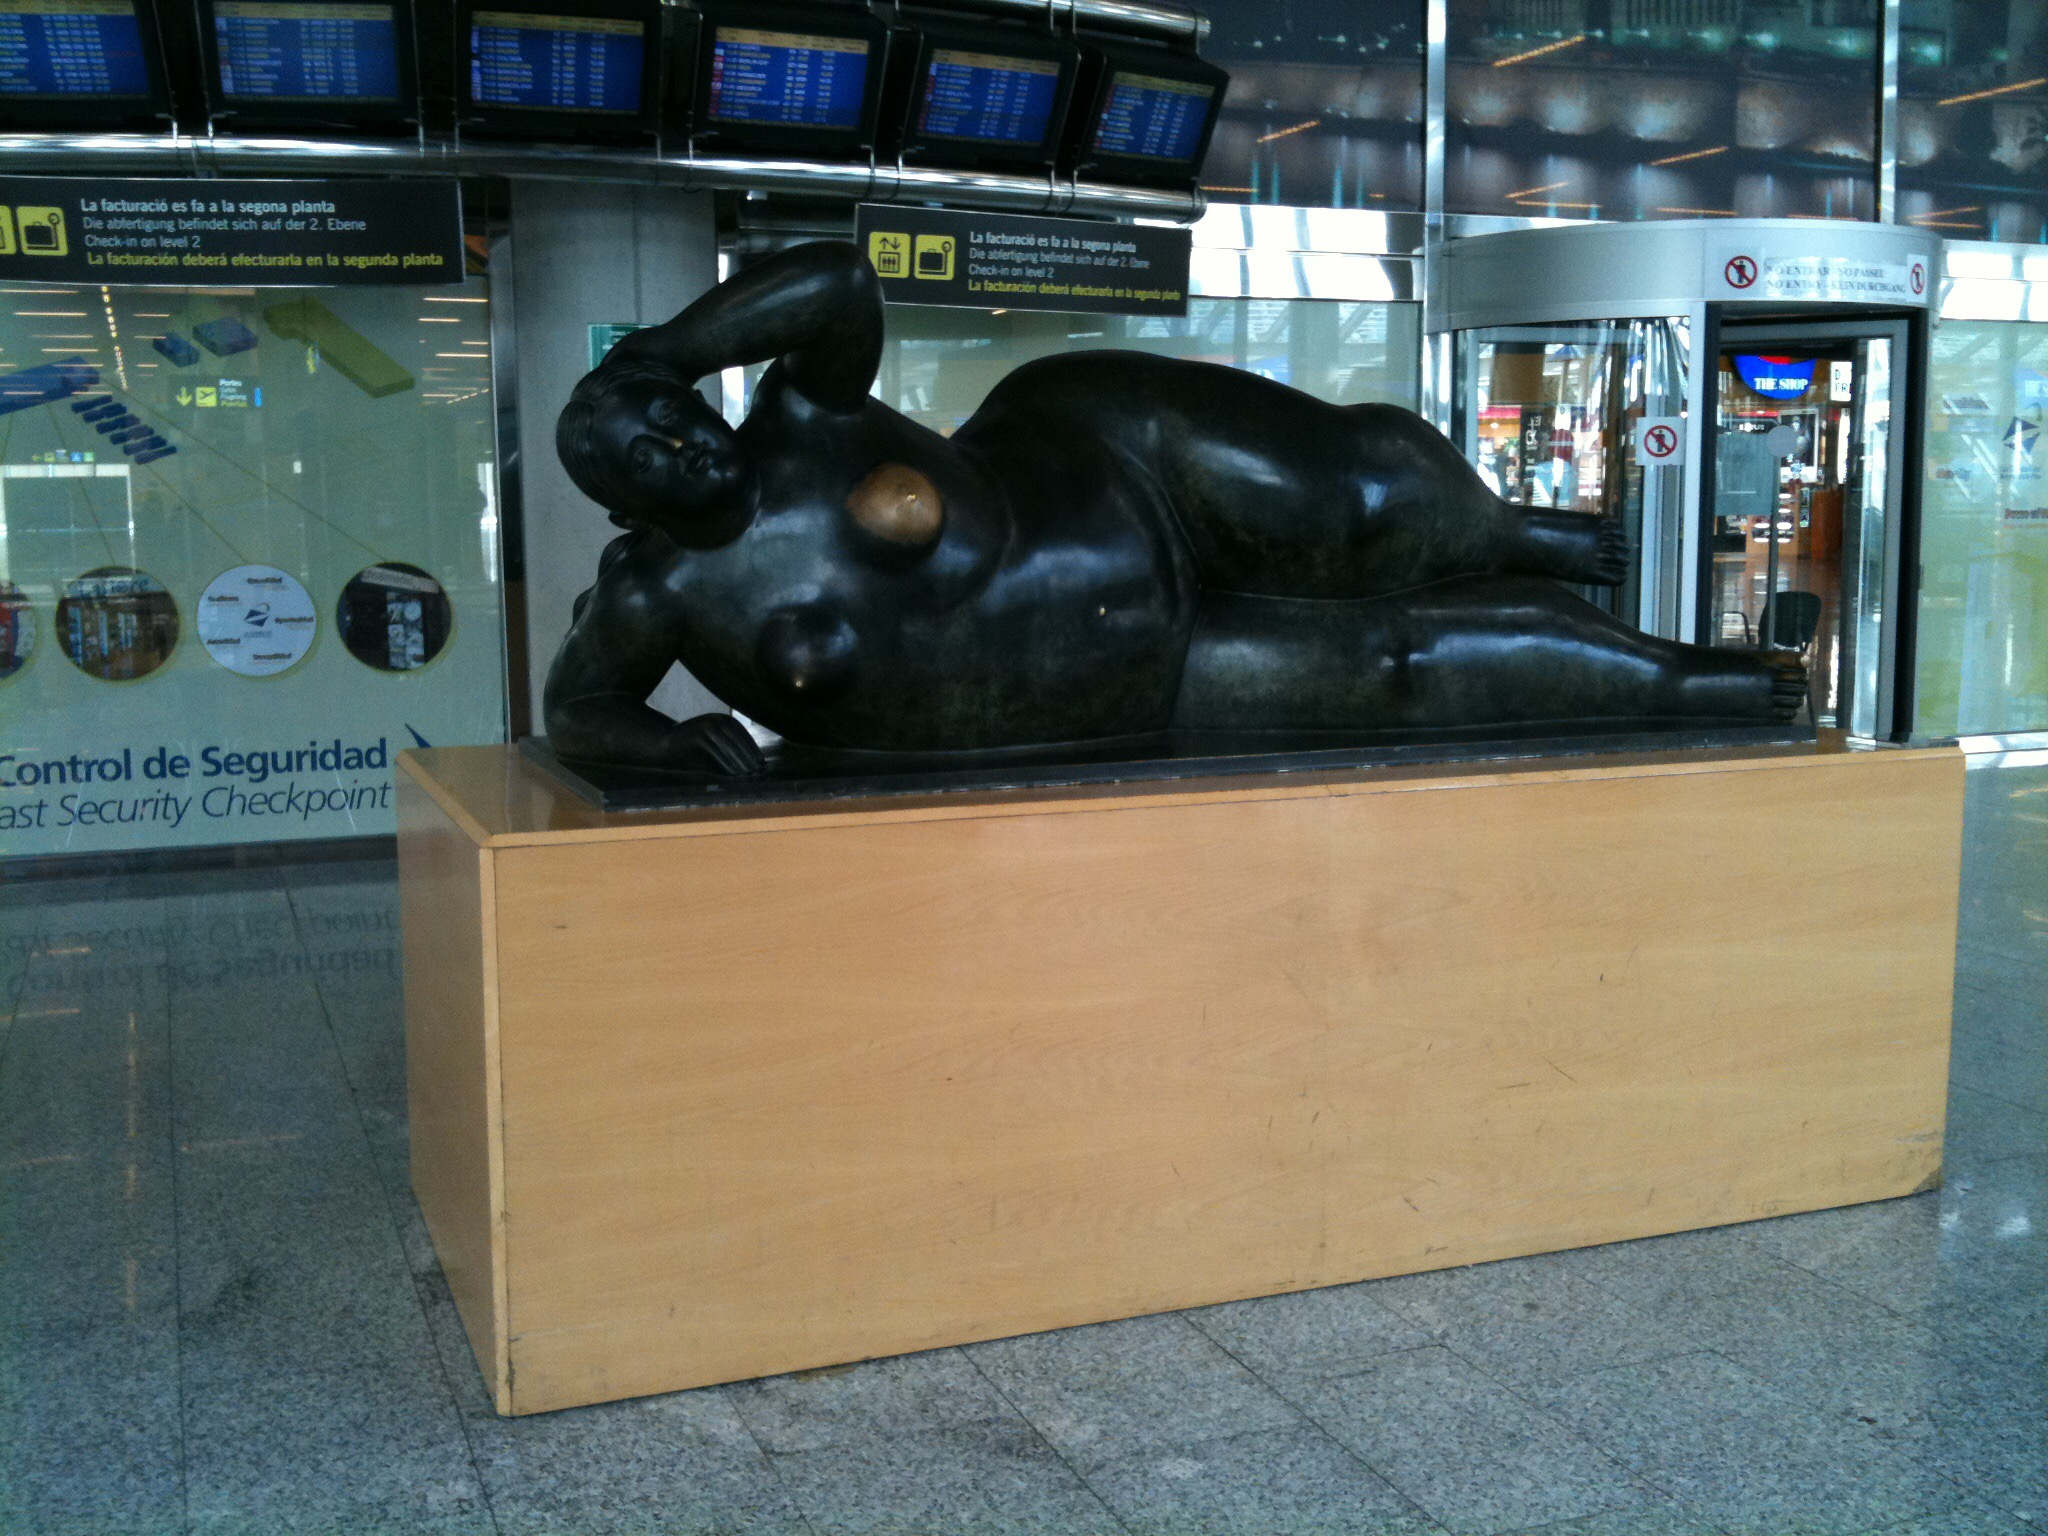 Statue auf dem Flughafen in Palma de Mallorca